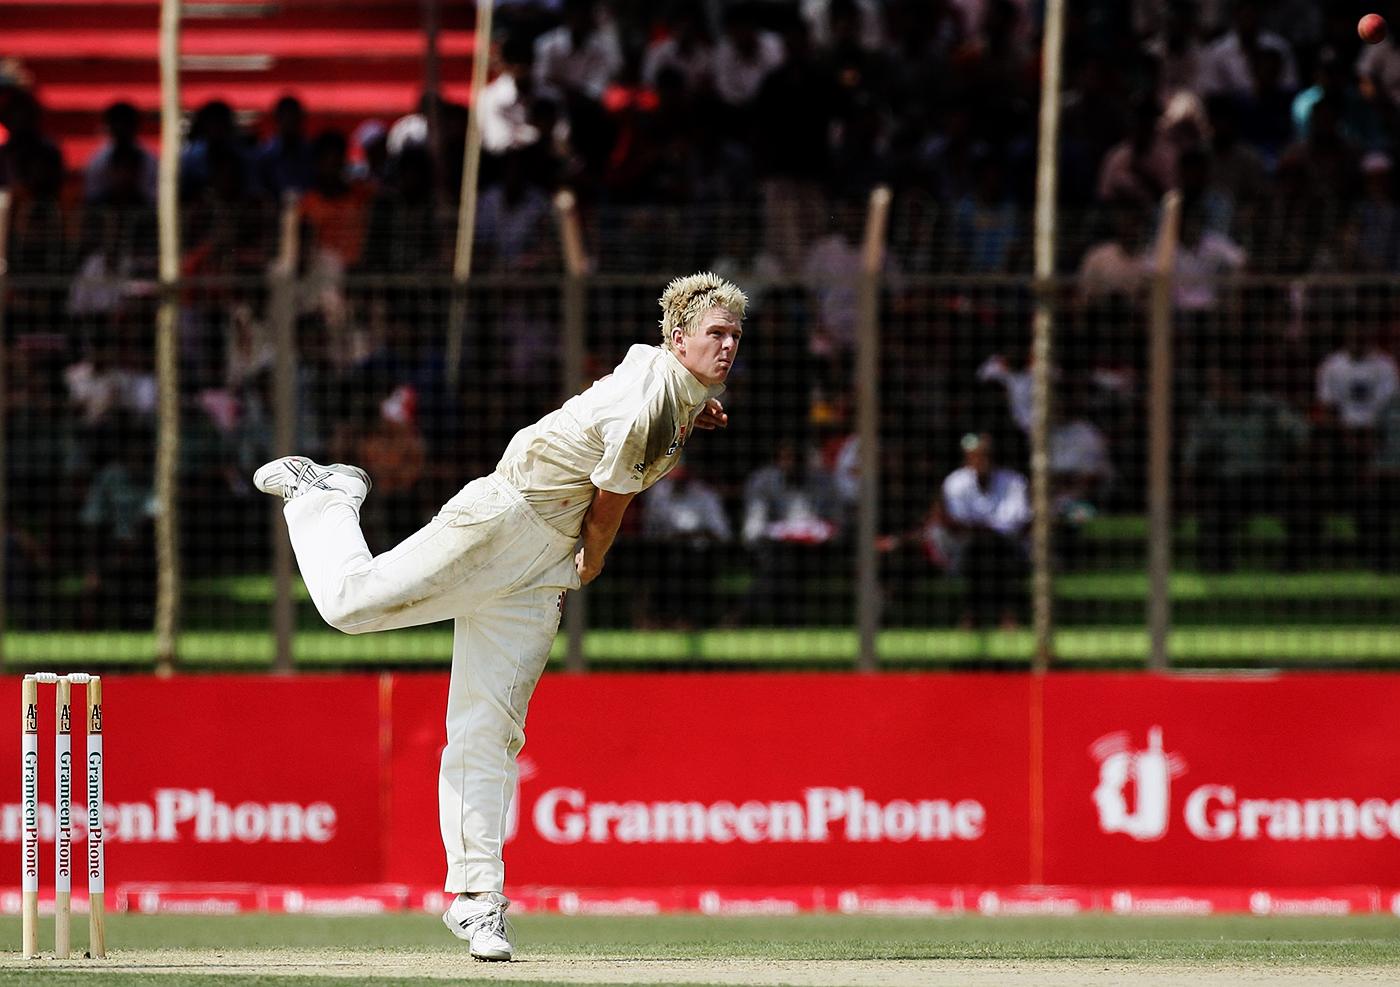 Dan Cullen bowls on Test debut